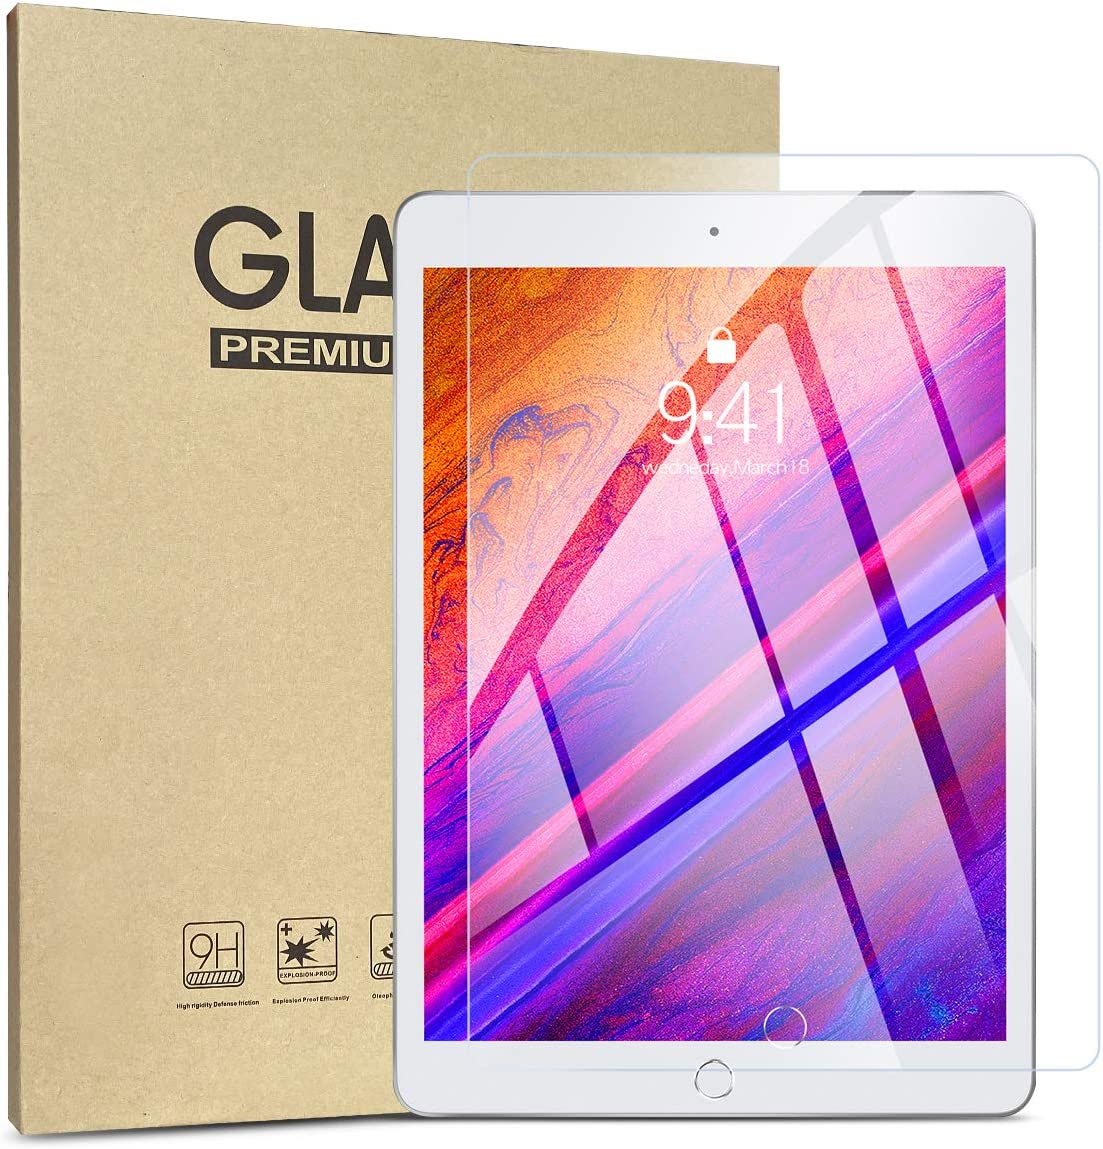 iPad 10.2 Screen Protector,Screen Protector for iPad 7th Generation (iPad 2019), Compatible with 10.2 Inch Retina Display/Apple Pencil(2 PCS)